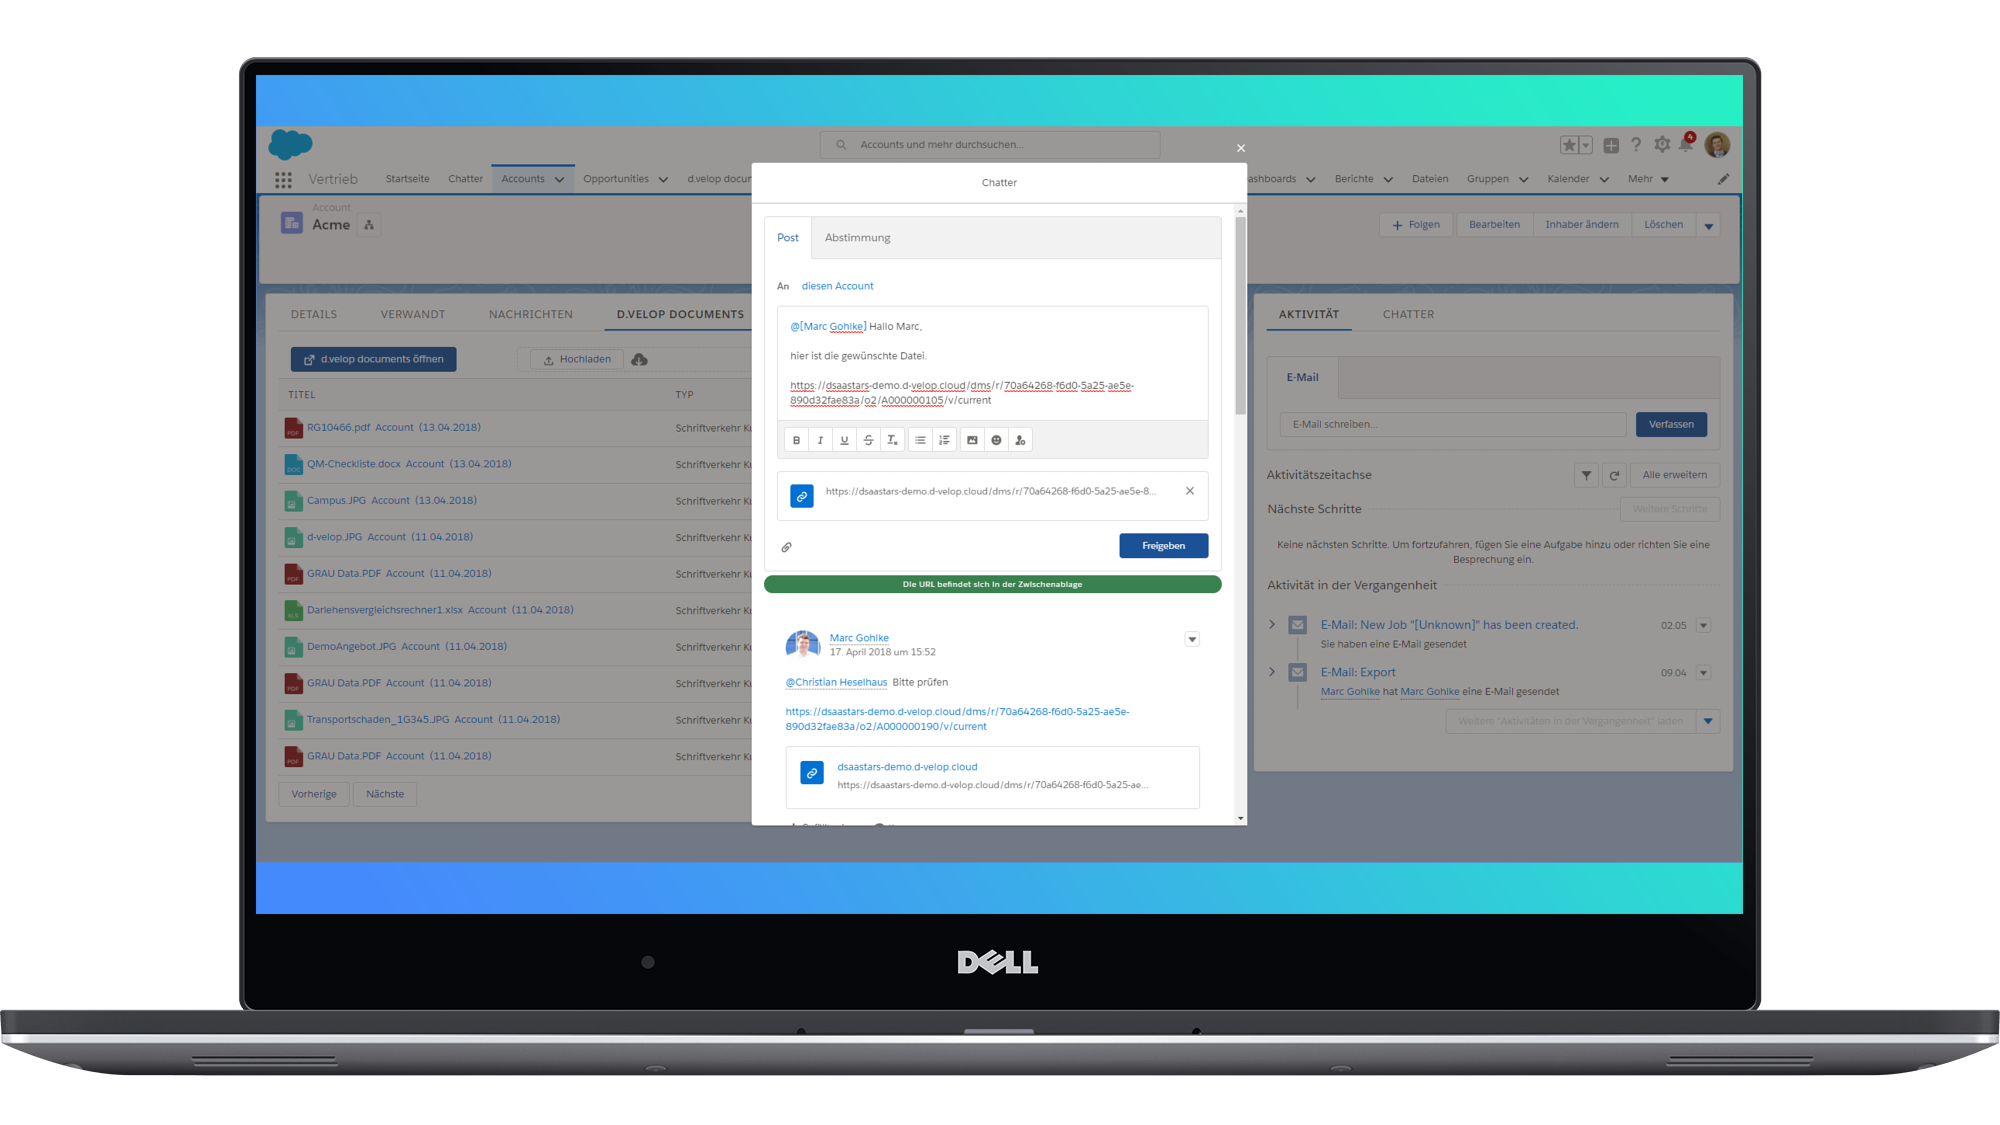 d-velop-documents-for-salesforce-chatter_Integration.png